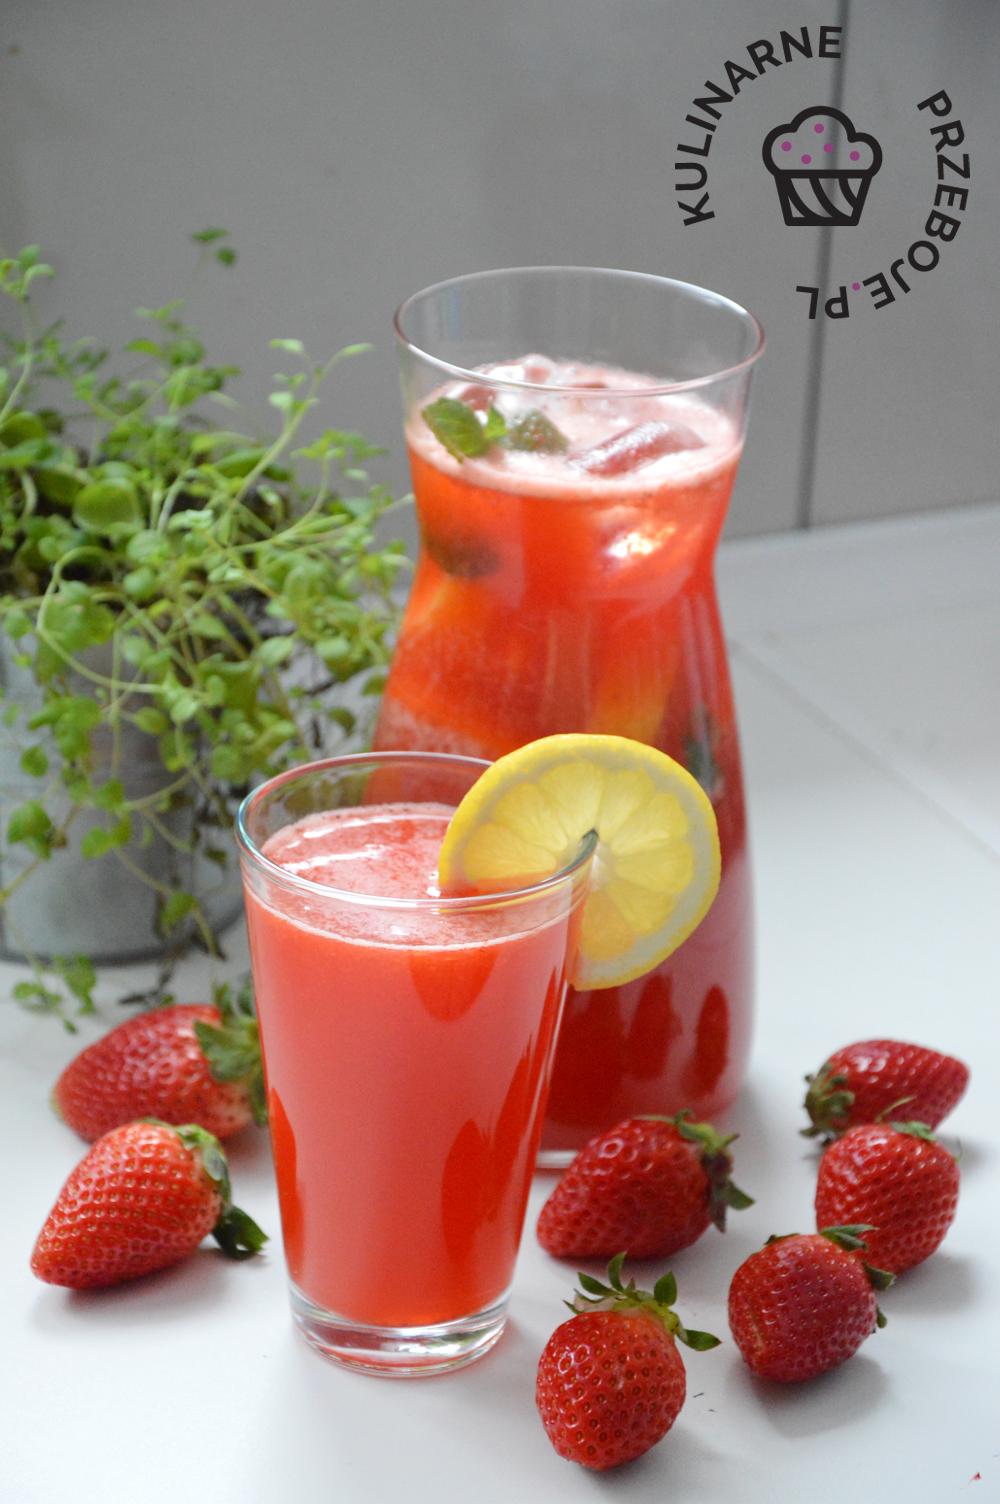 lemoniada z truskawek i cytryny